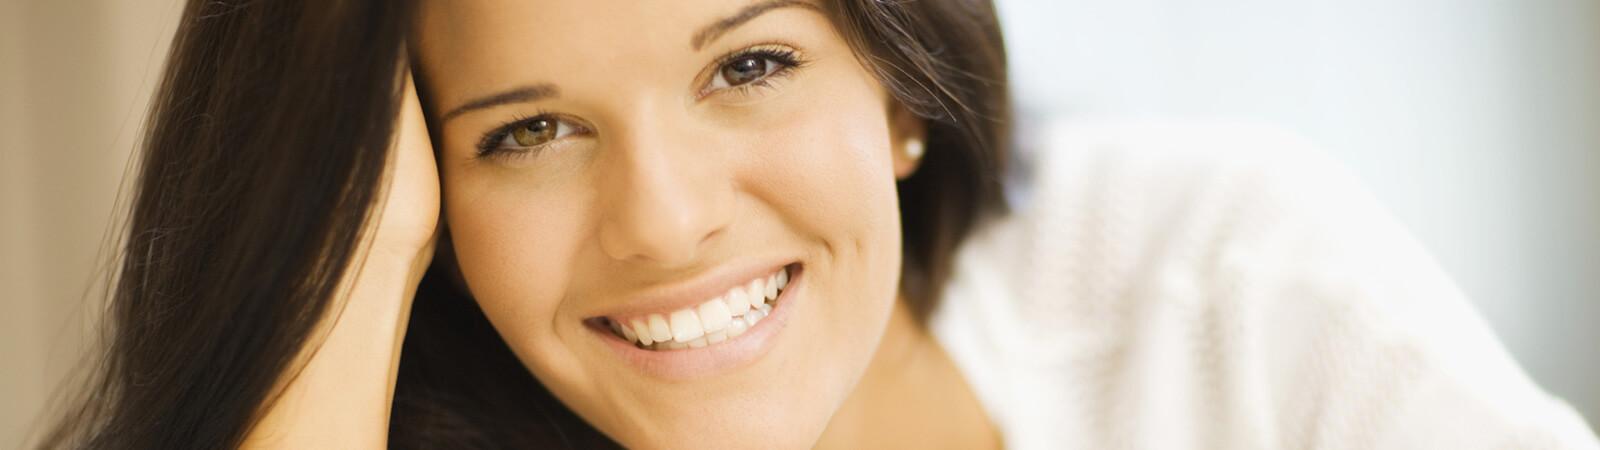 Contact Us - Vivid Dental, Houston TX